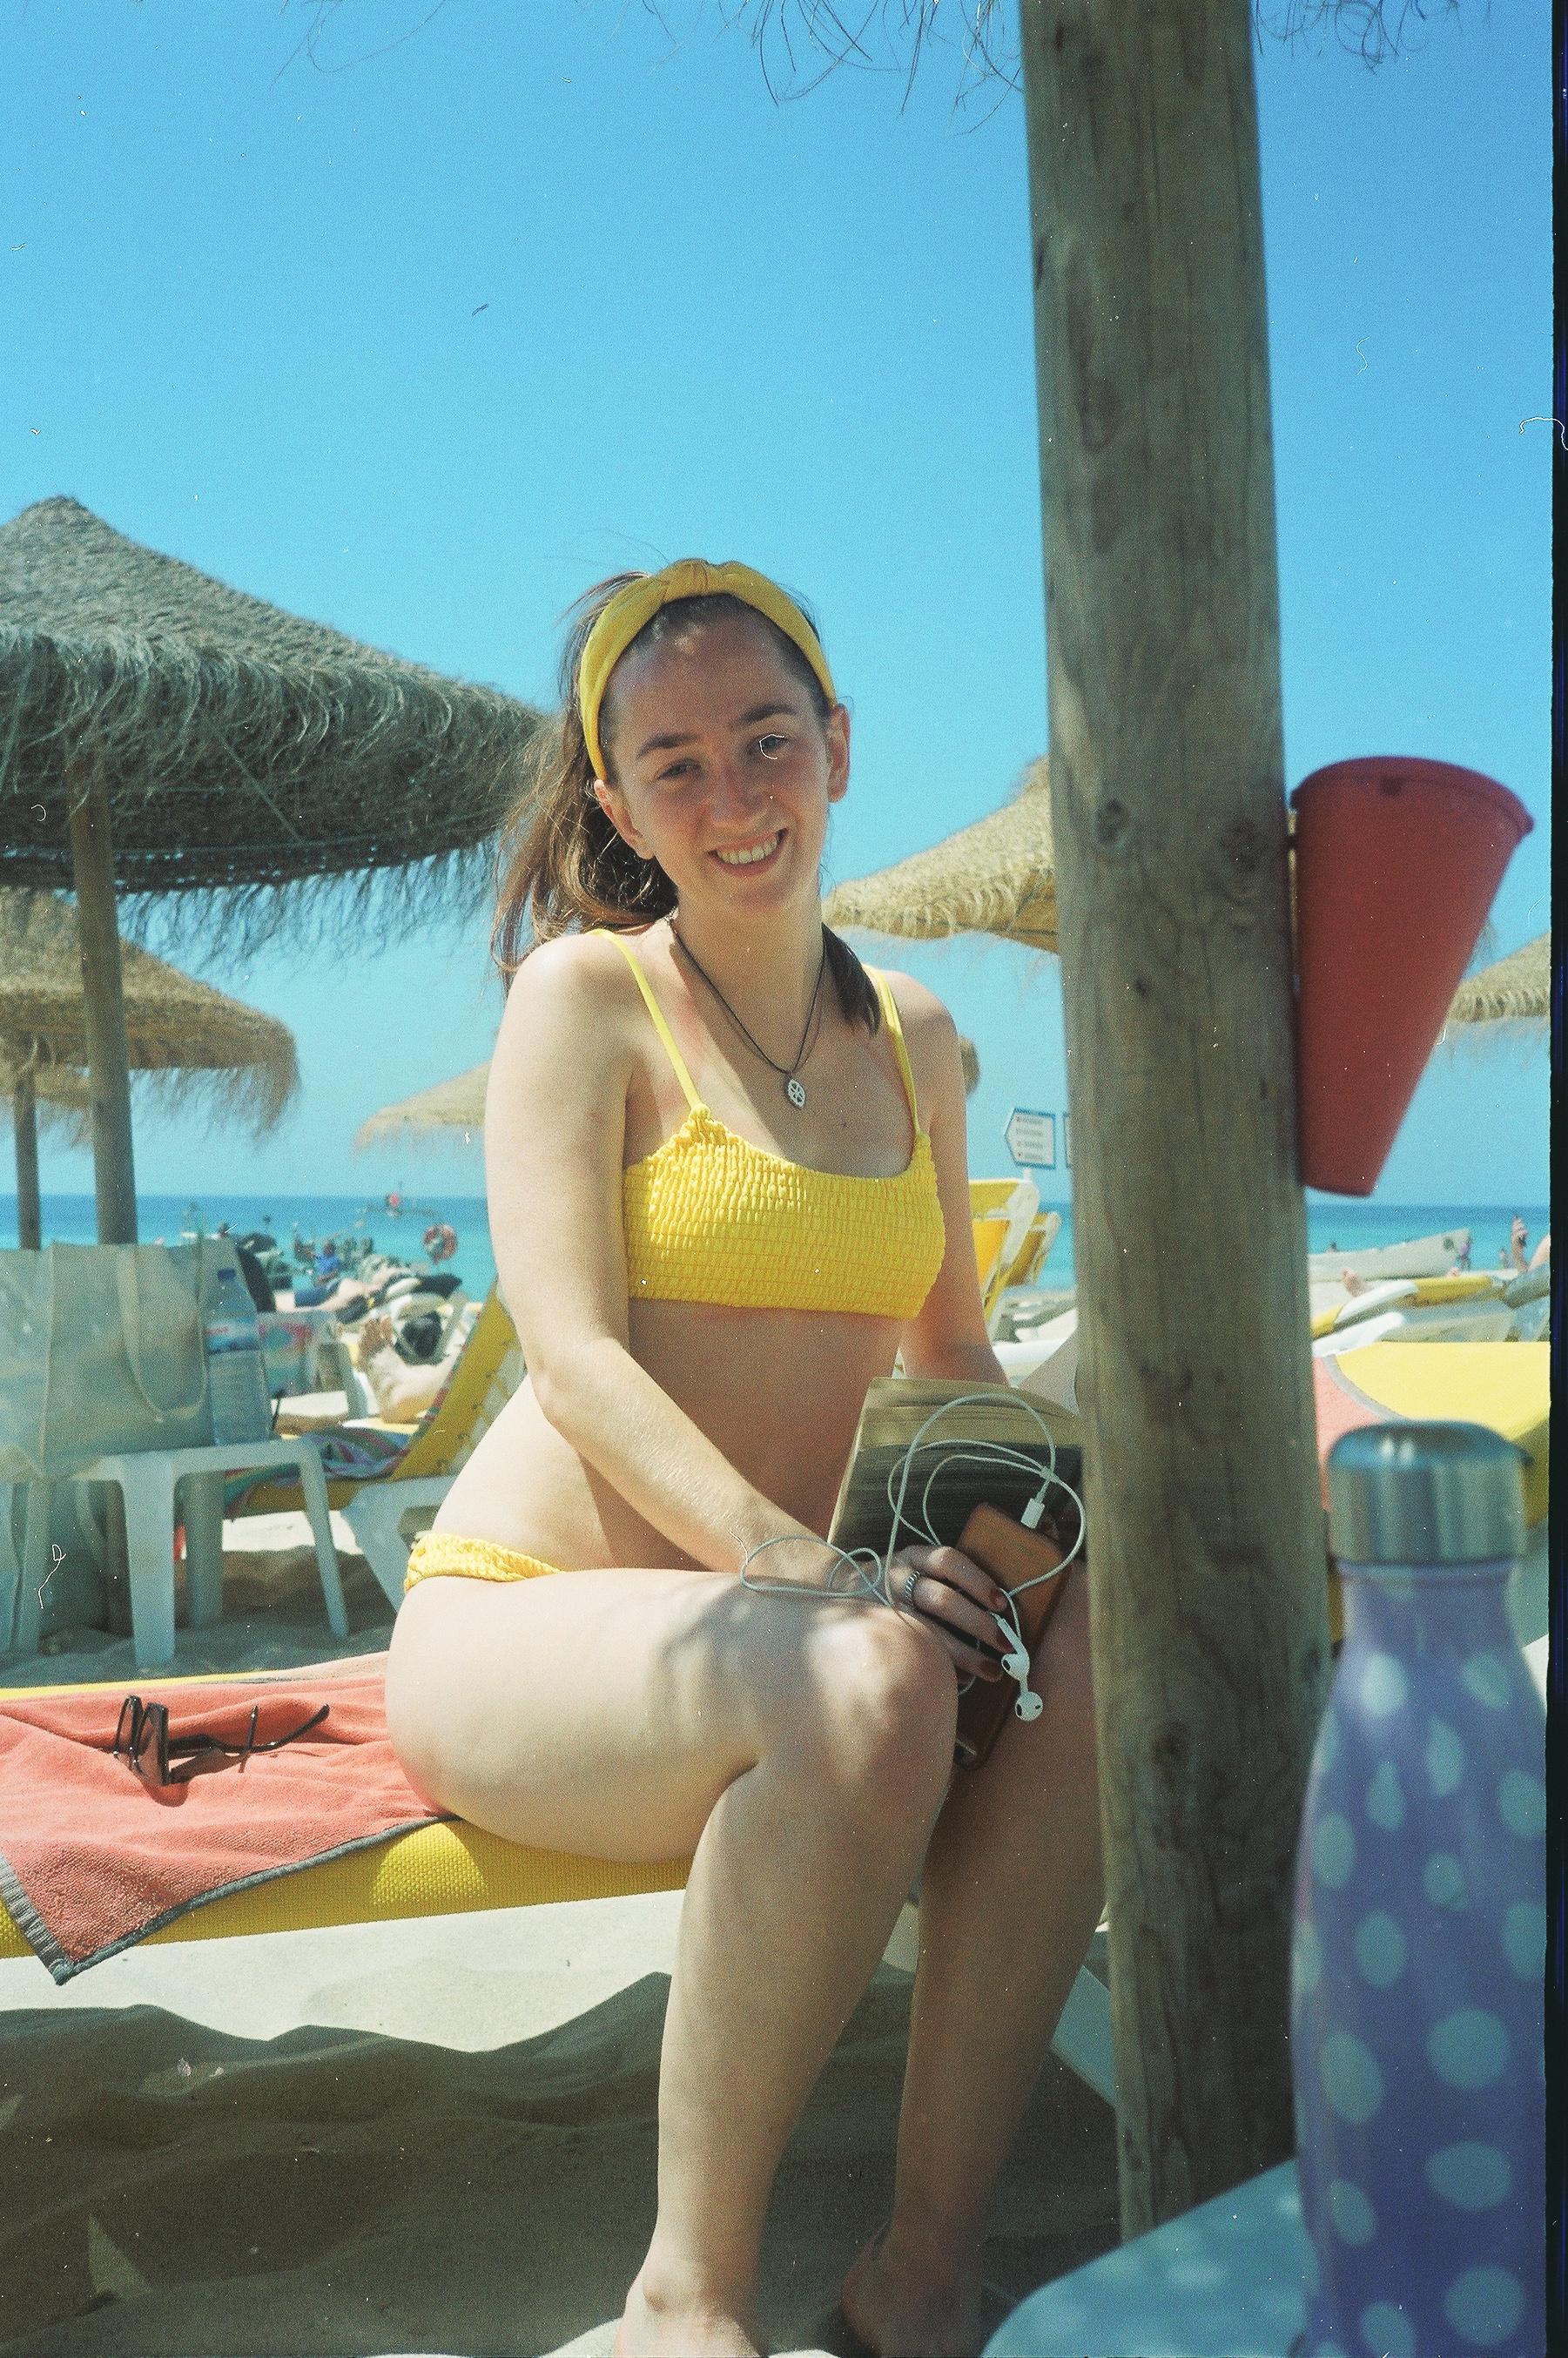 a-girls-trip-to-portugal-on-35mm-film44.jpg